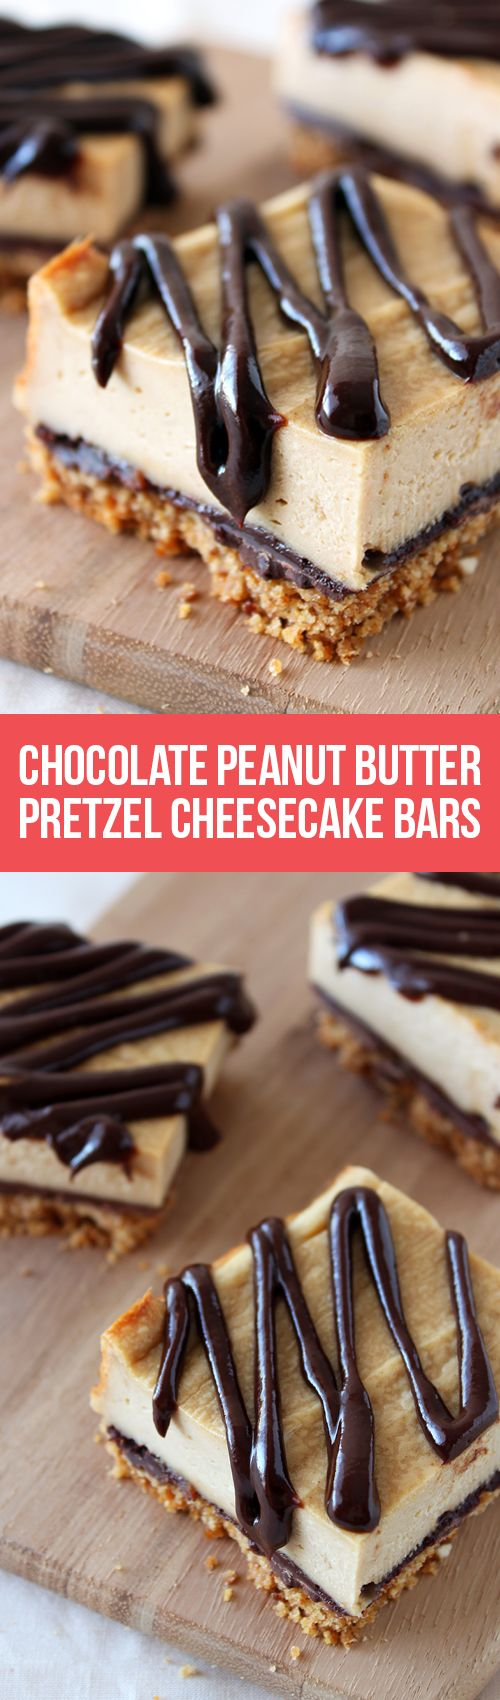 Chocolate Peanut Butter Pretzel Cheesecake Bars have a salty pretzel crust with chocolate peanut butter ganache drizzled over the peanut butter cheesecake!